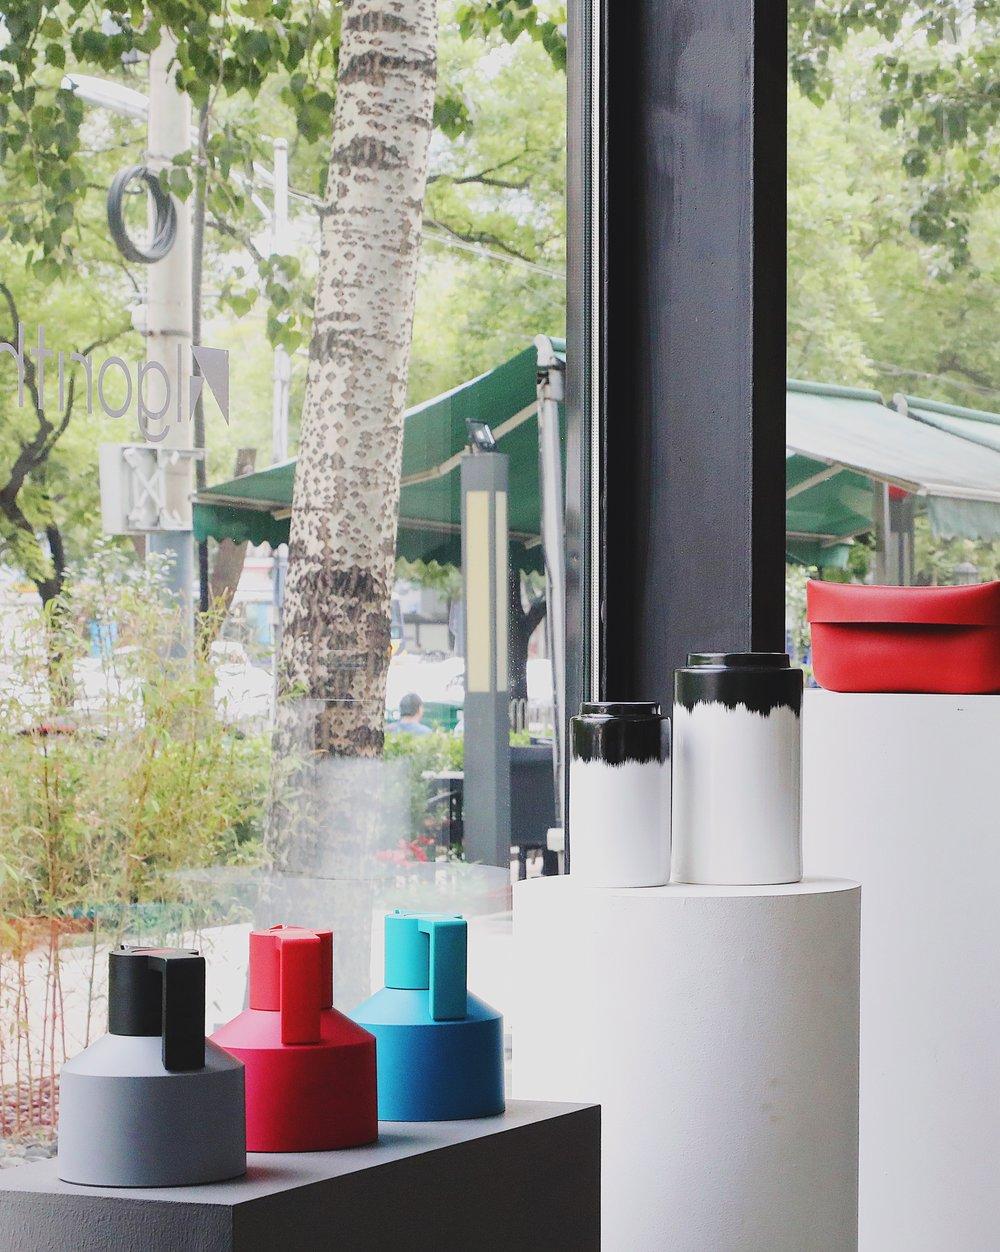 Normann Copenhagen - Normann Copenhagen 于1999年由Jan Andersen 和Poul Madsen 共同成立,目标是为设计产业带来革新。Normann Copenhagen 的产品拥有简洁的造型和活泼的色彩,一眼便可识别。我们注重的是实用和美学并存,结合丹麦传统手工工艺和现代工业技术,打造外观优雅、能够搭配各种风格环境的家具。